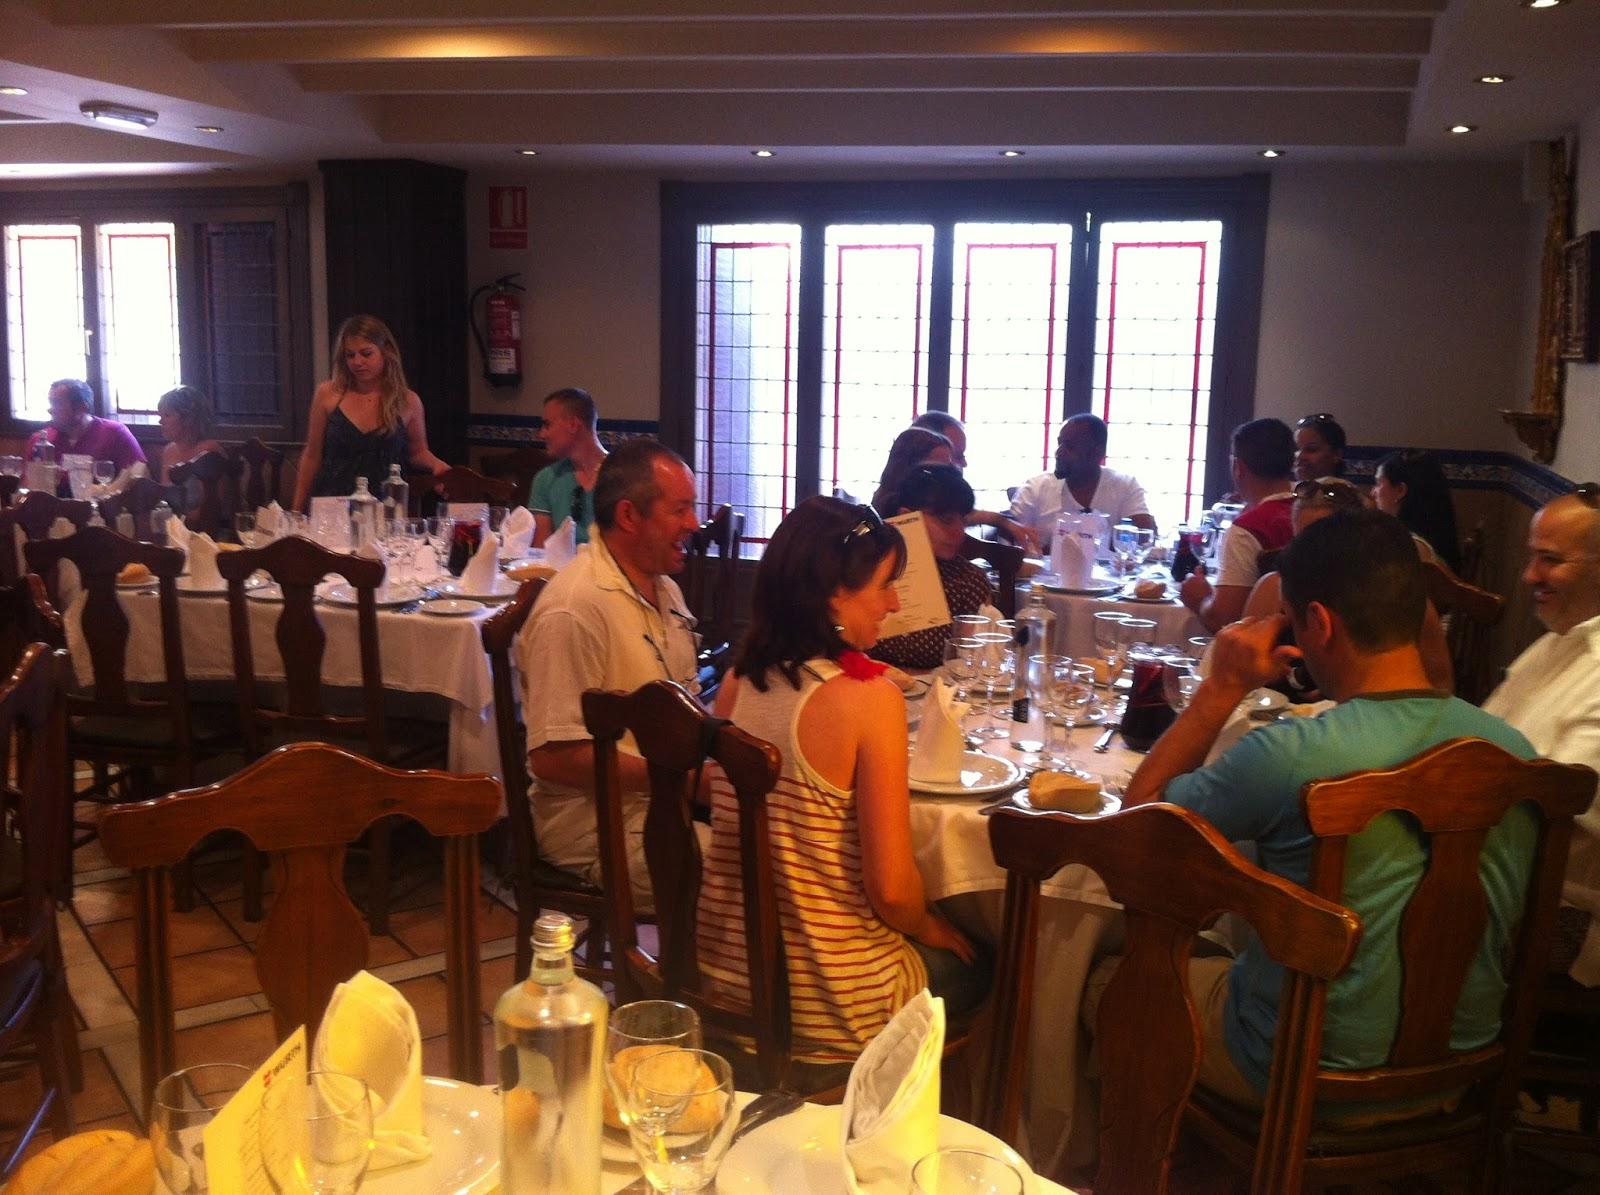 Restaurant El Cabildo Séville